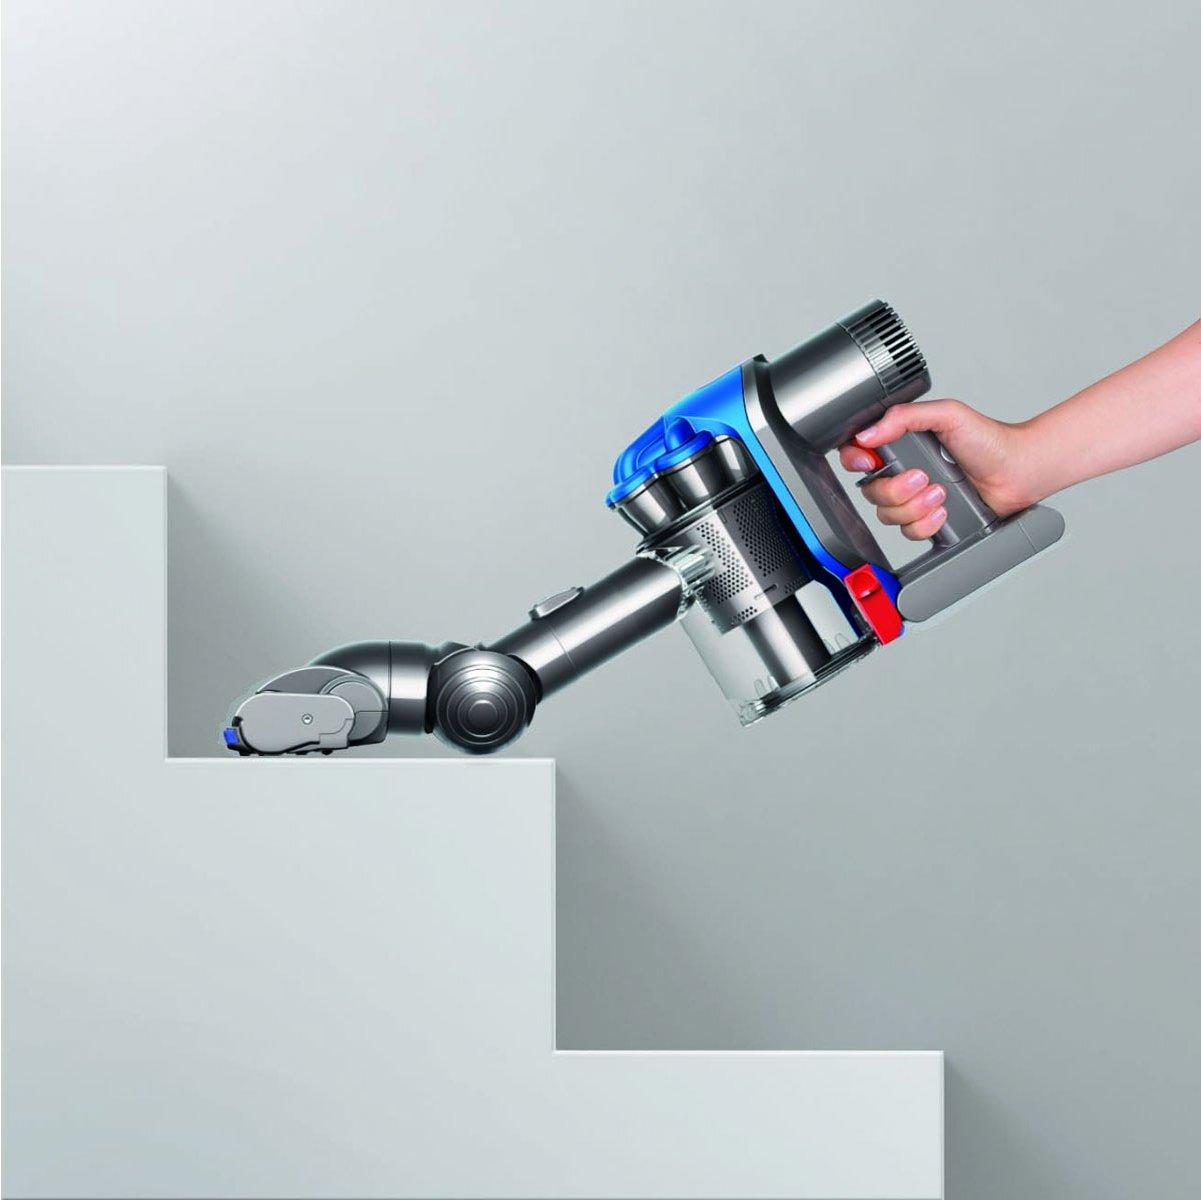 dyson dc35 multi floor cordless vacuum cleaner. Black Bedroom Furniture Sets. Home Design Ideas